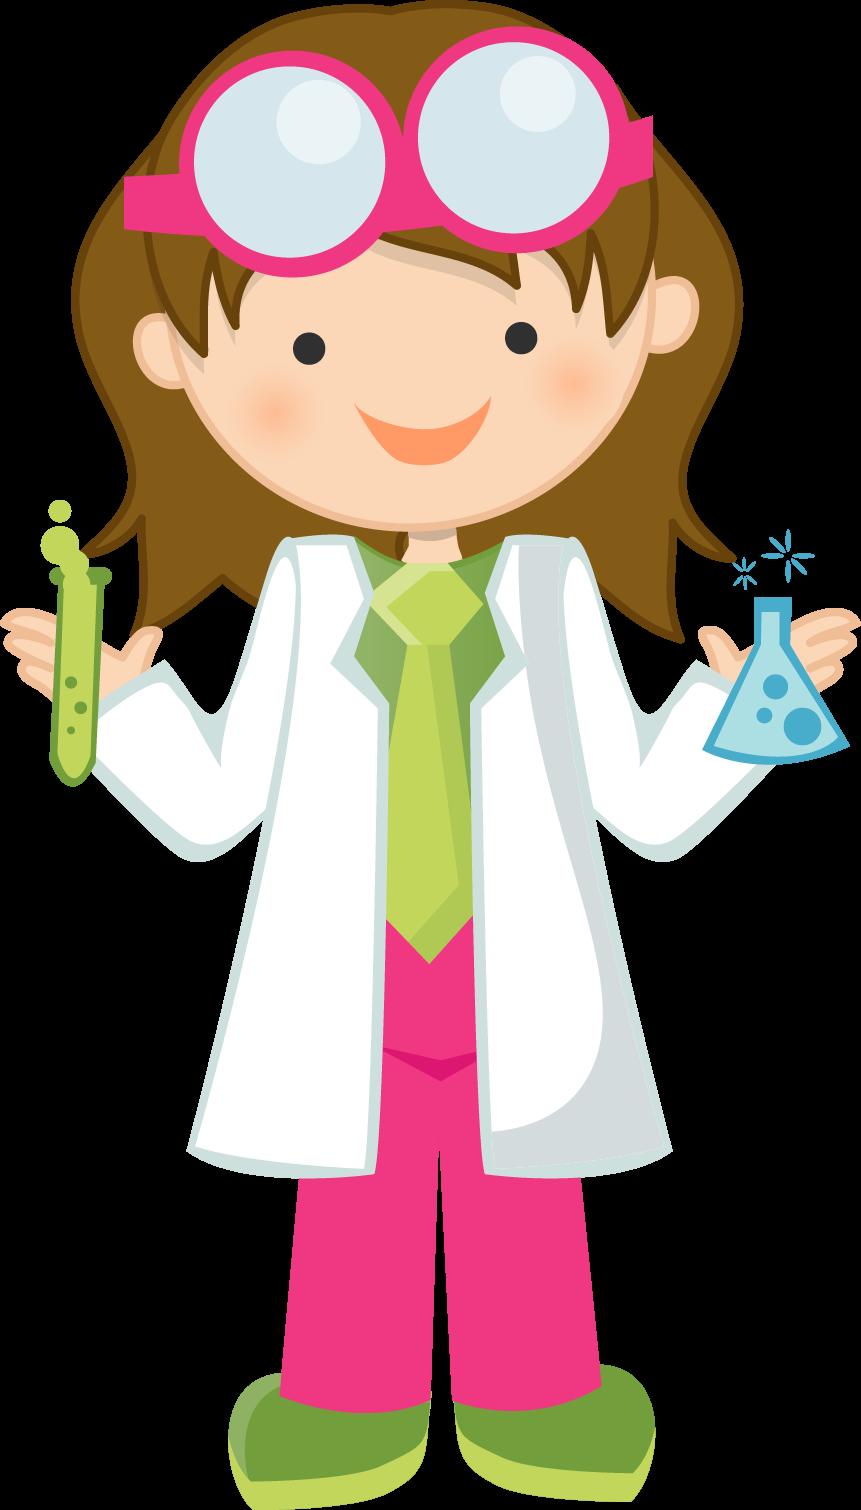 Scientist clipart science material, Scientist science.